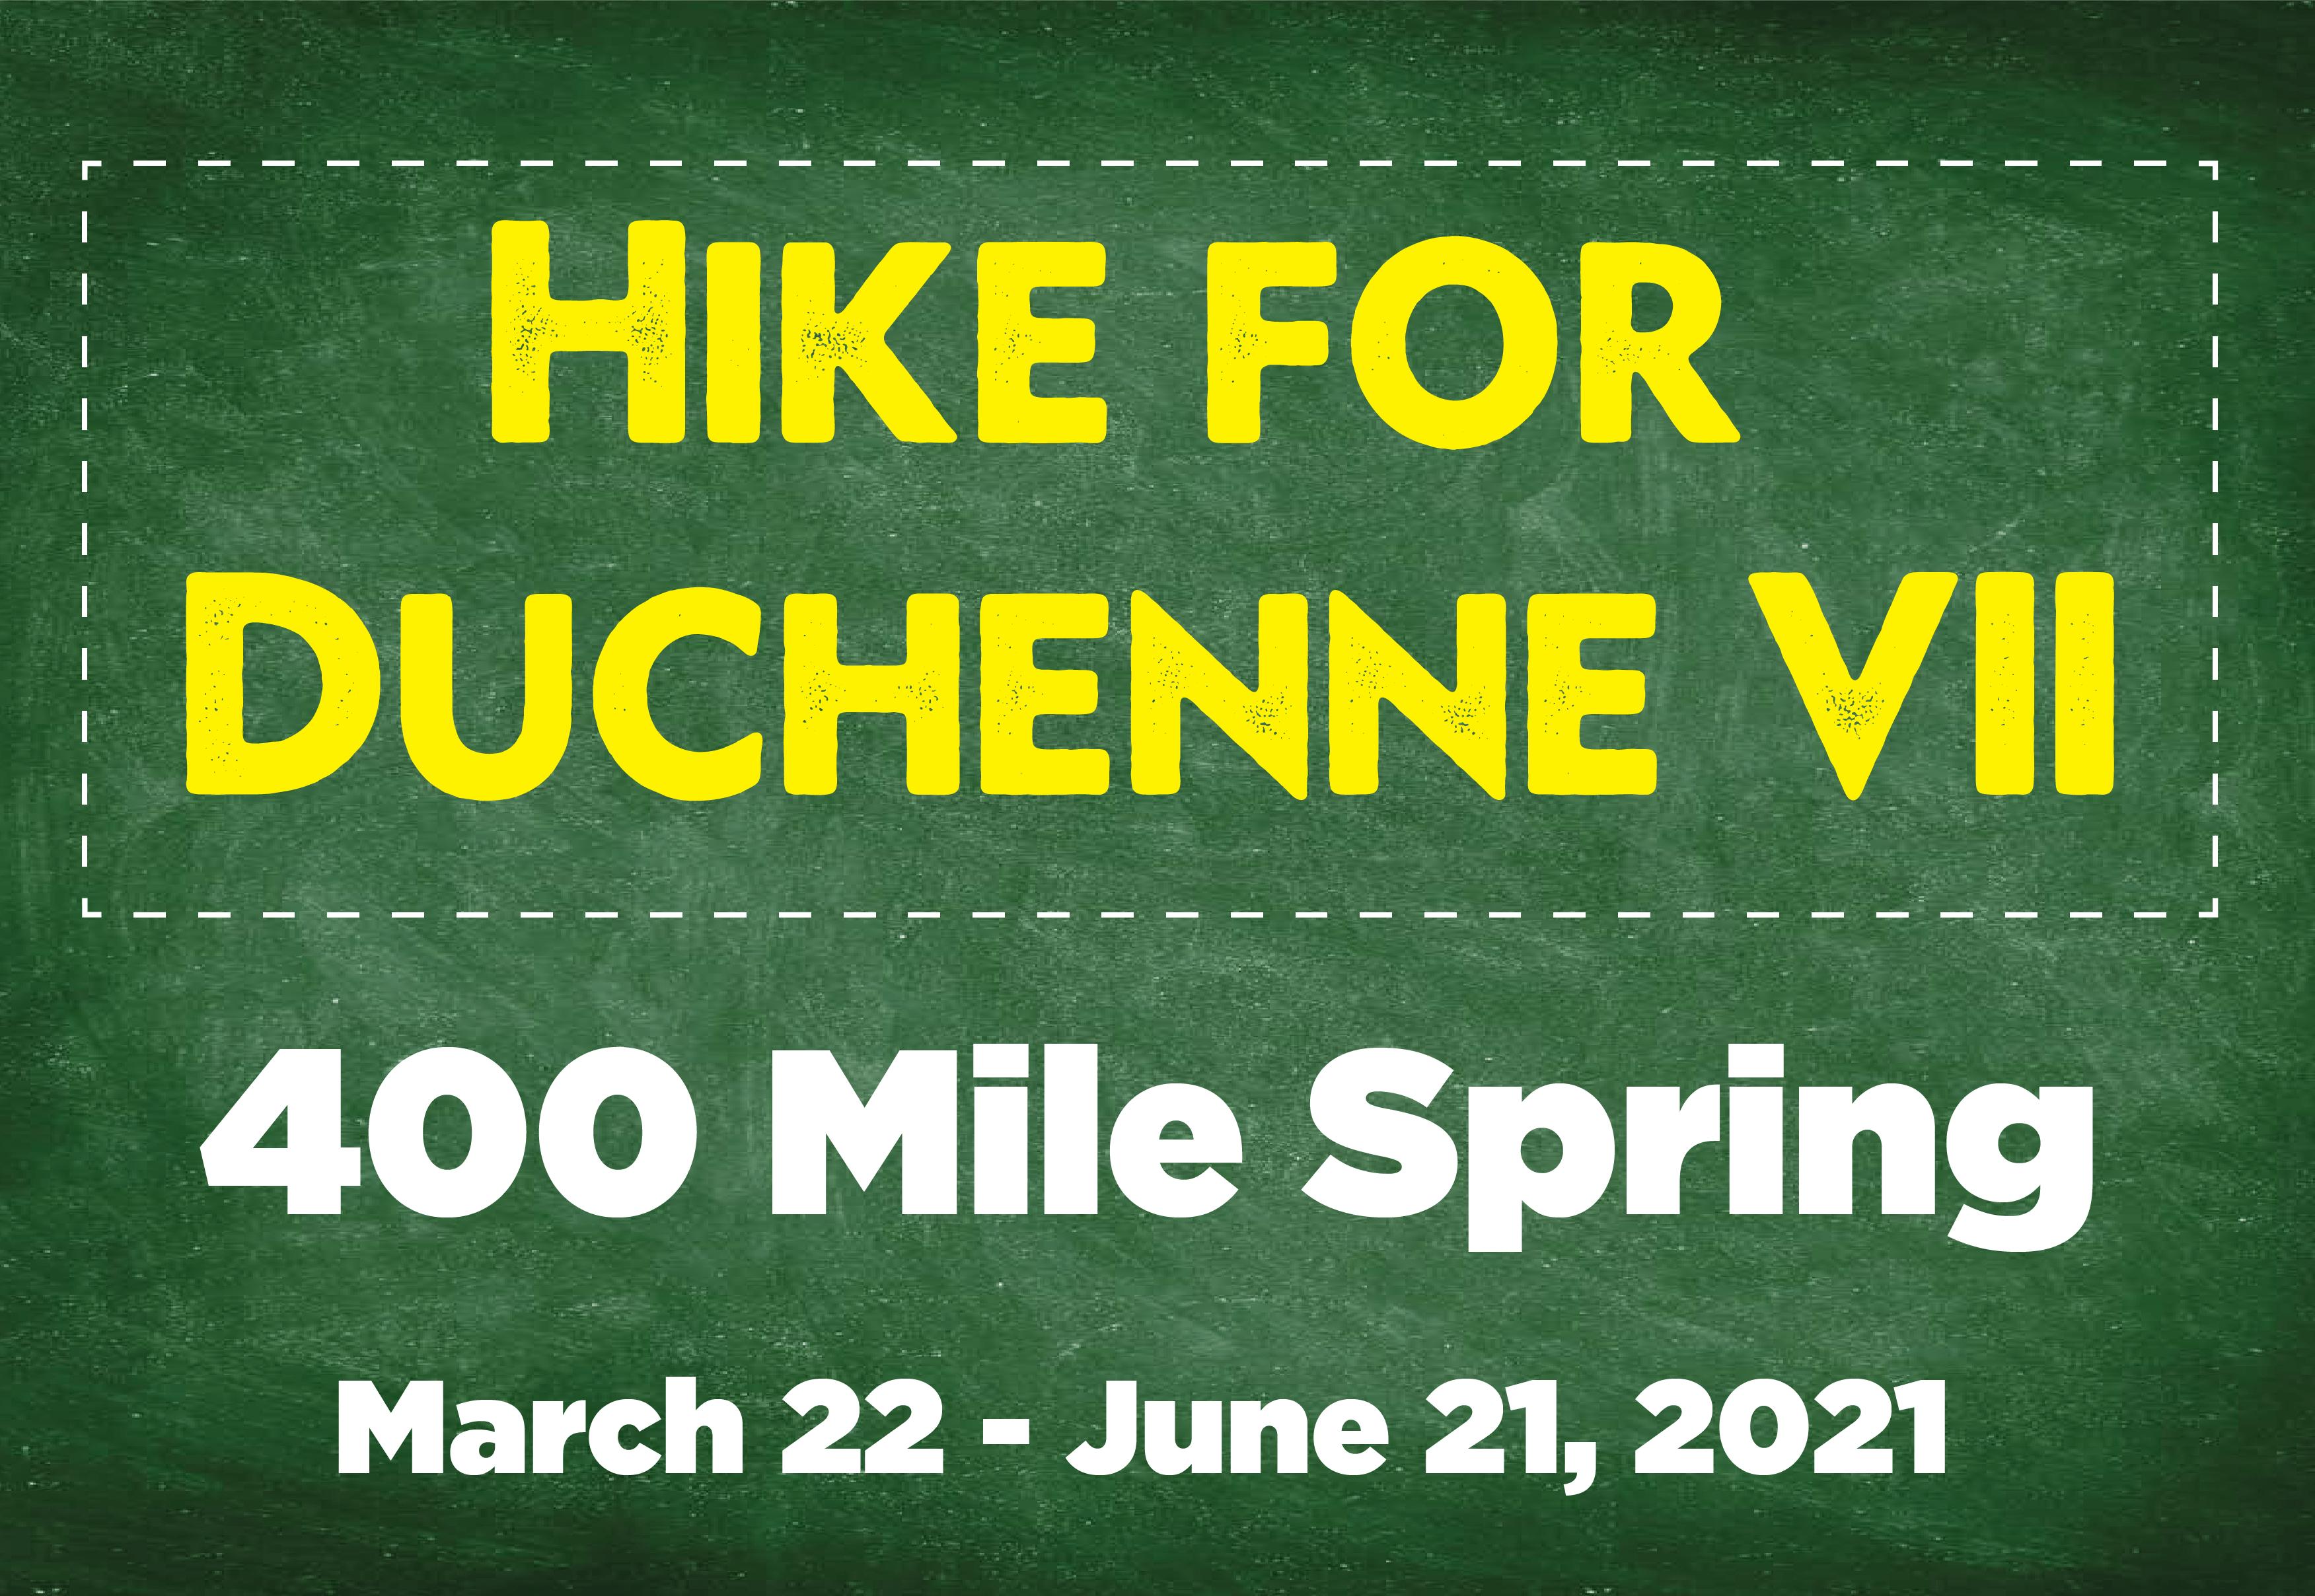 400 Mile Spring - Hike for Duchenne VII